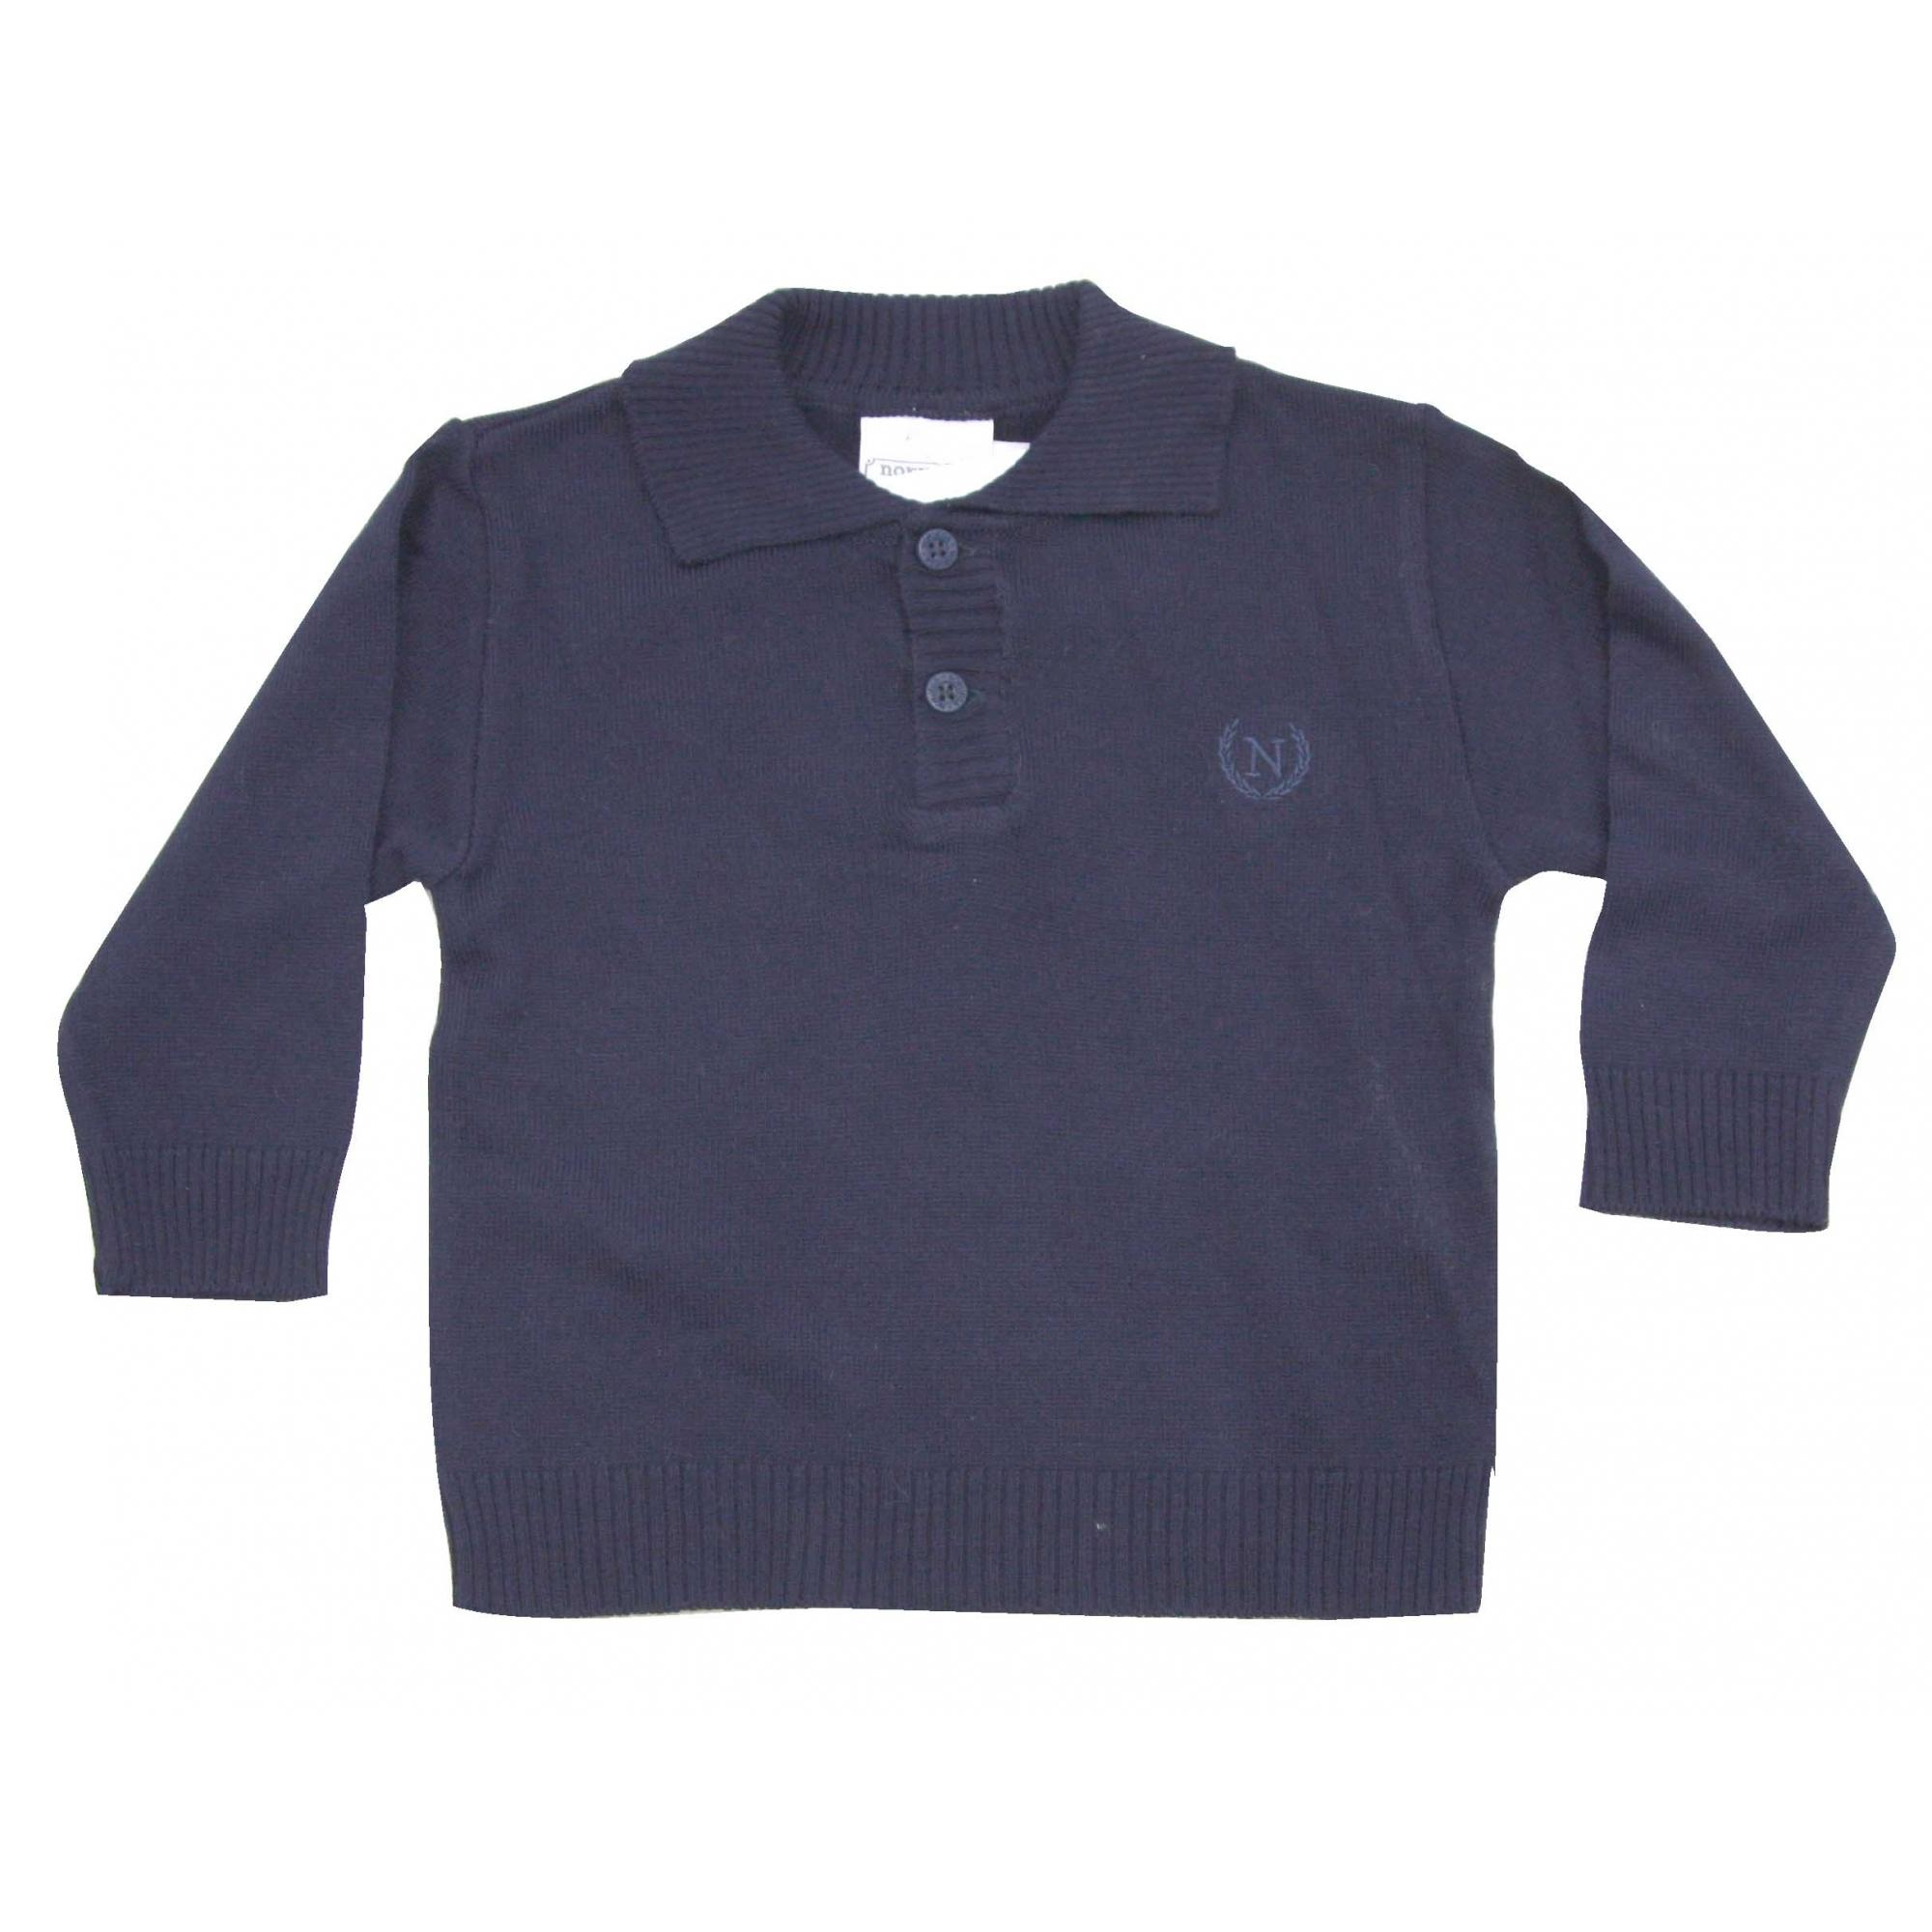 84.011 - Camisa Polo